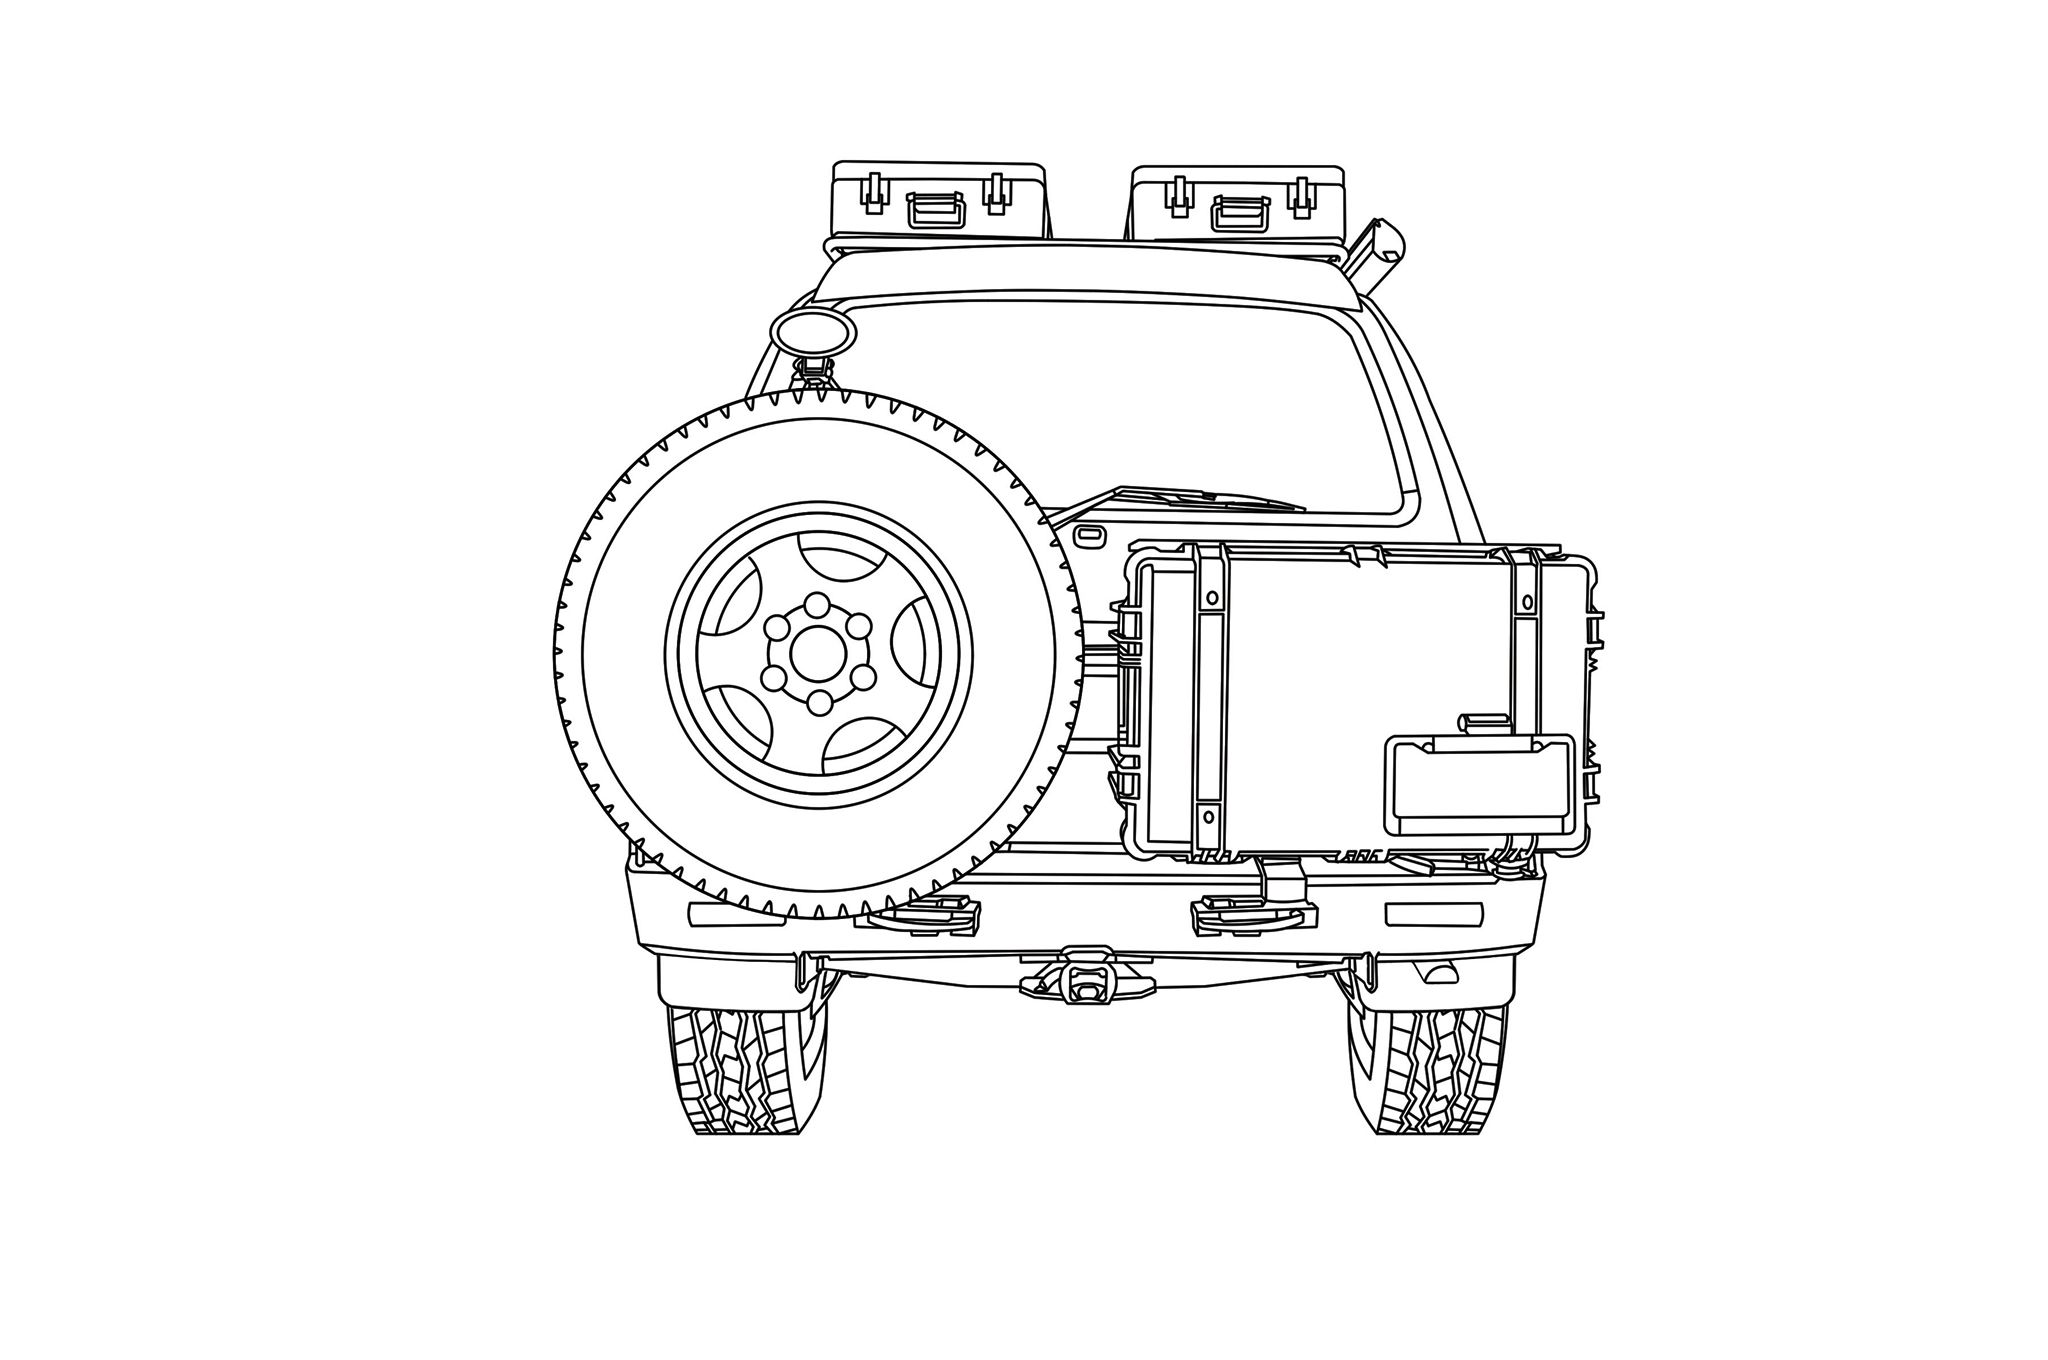 1994-toyota-land-cruiser-diagram-rear